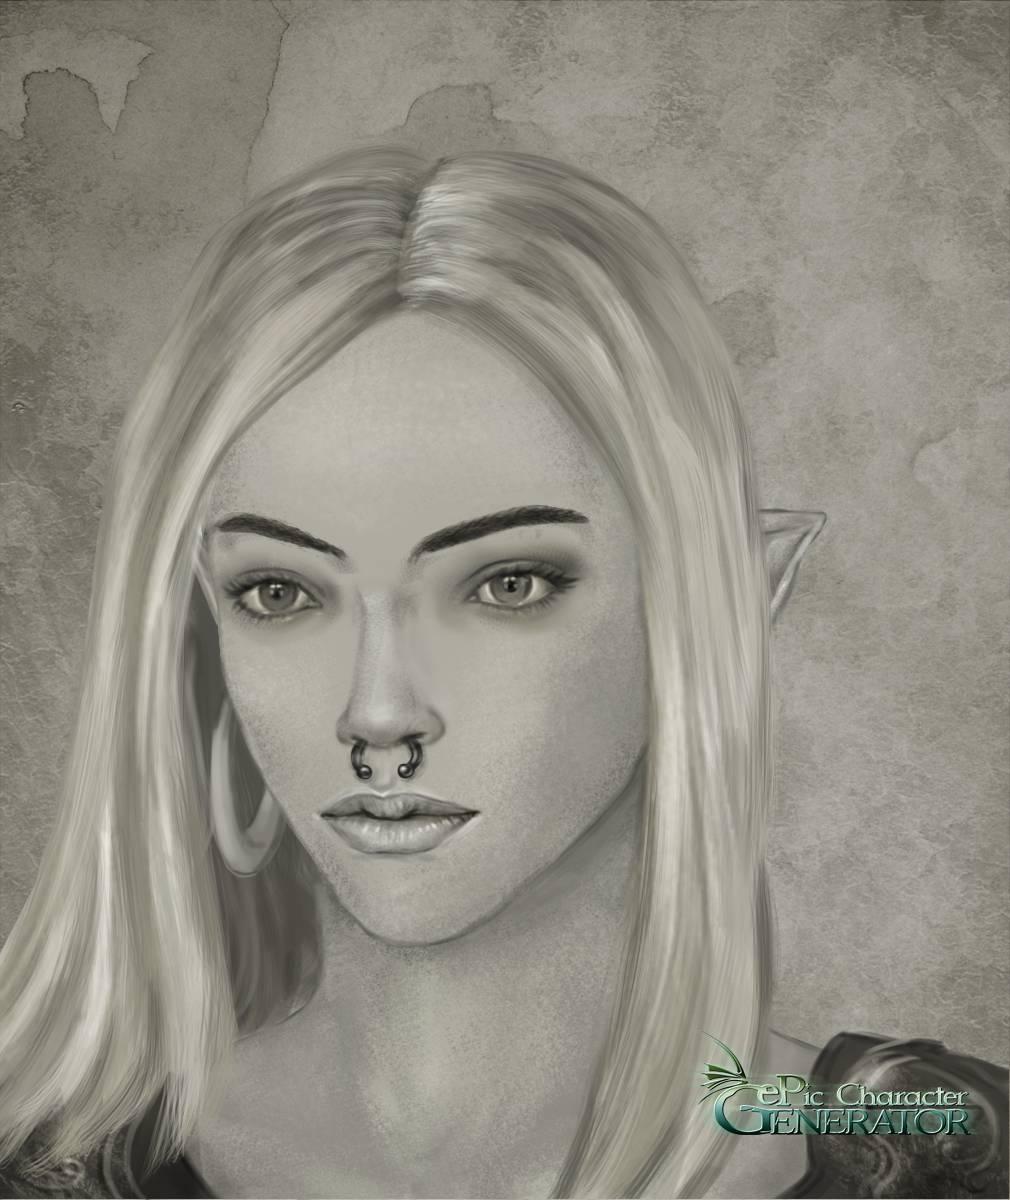 ePic Character Generator Season 3 Female Portrait Screenshot 06